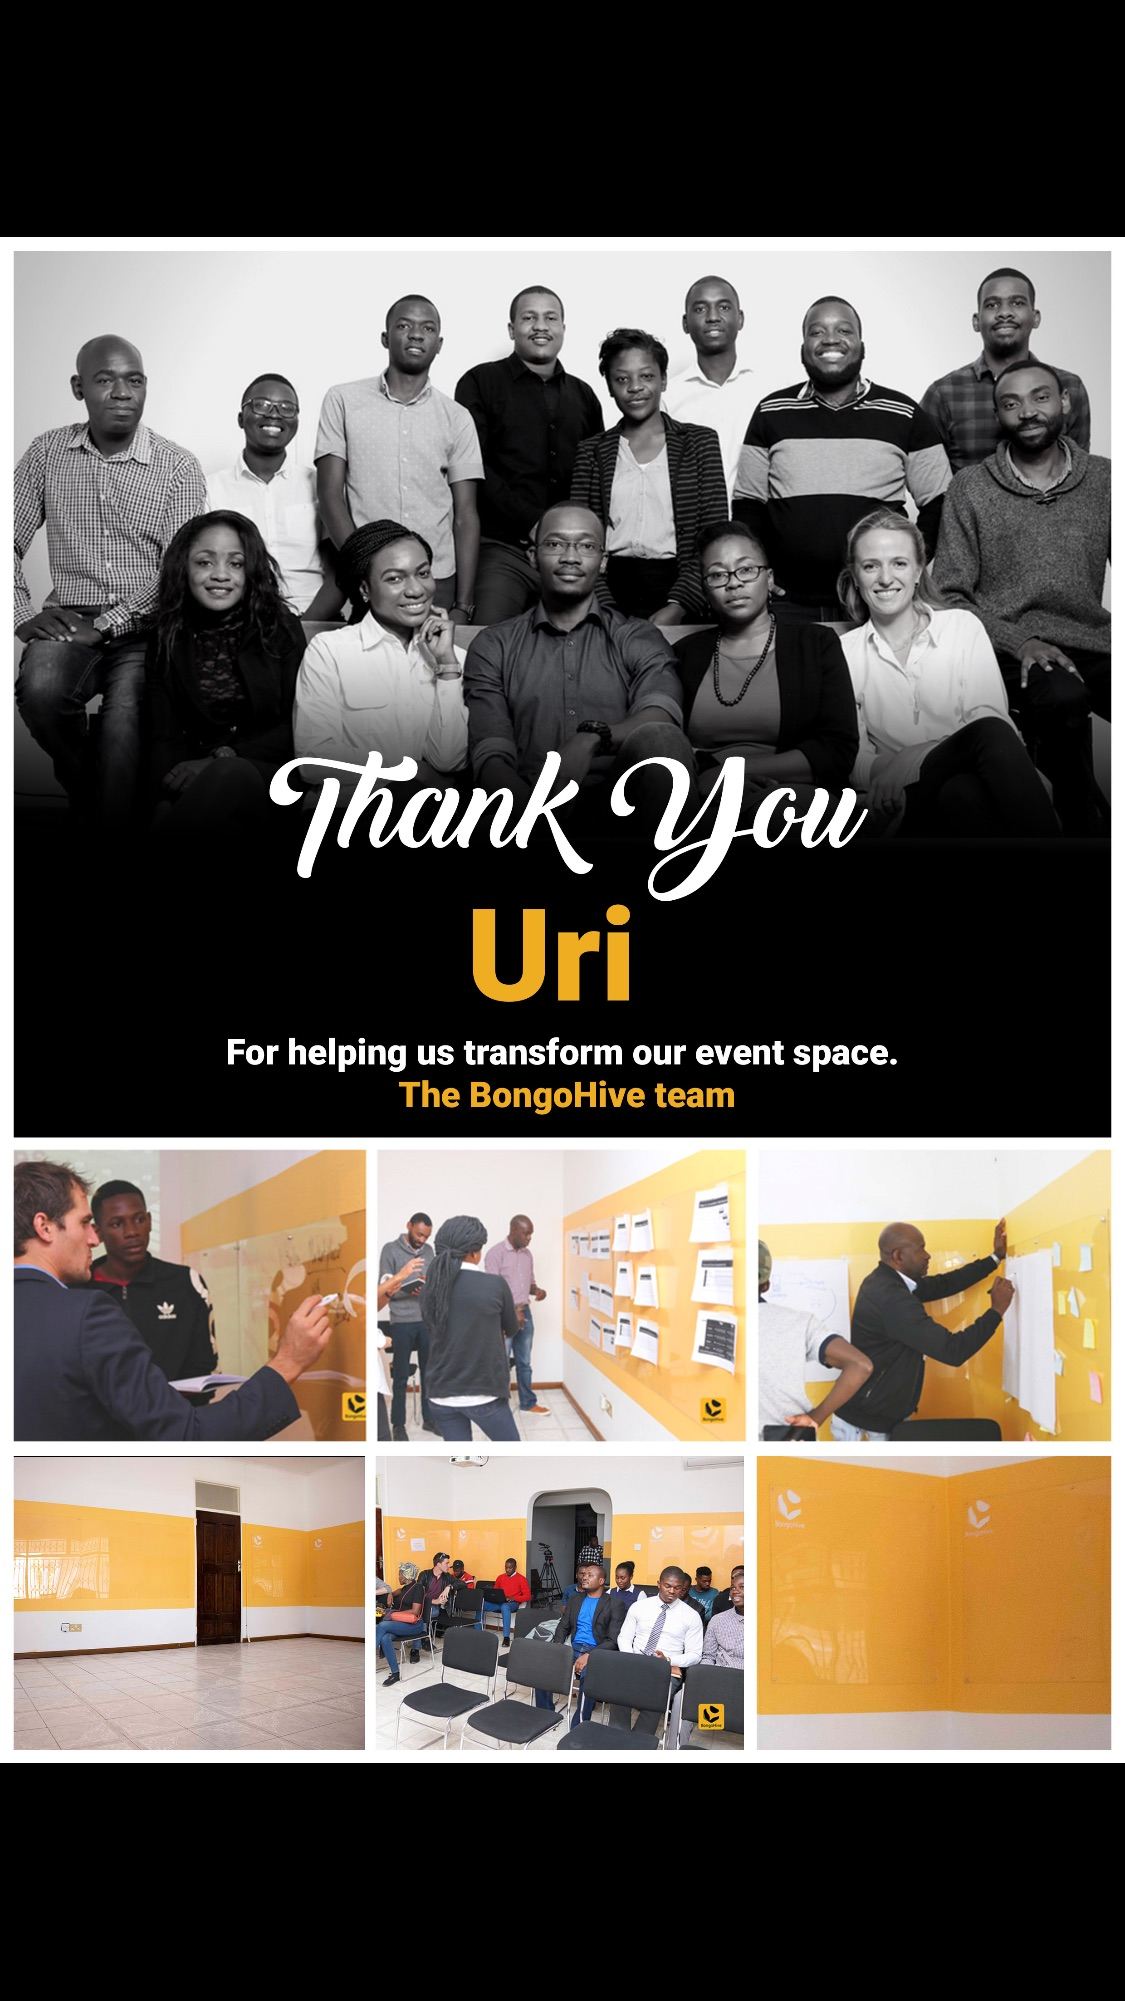 Thank you Uri